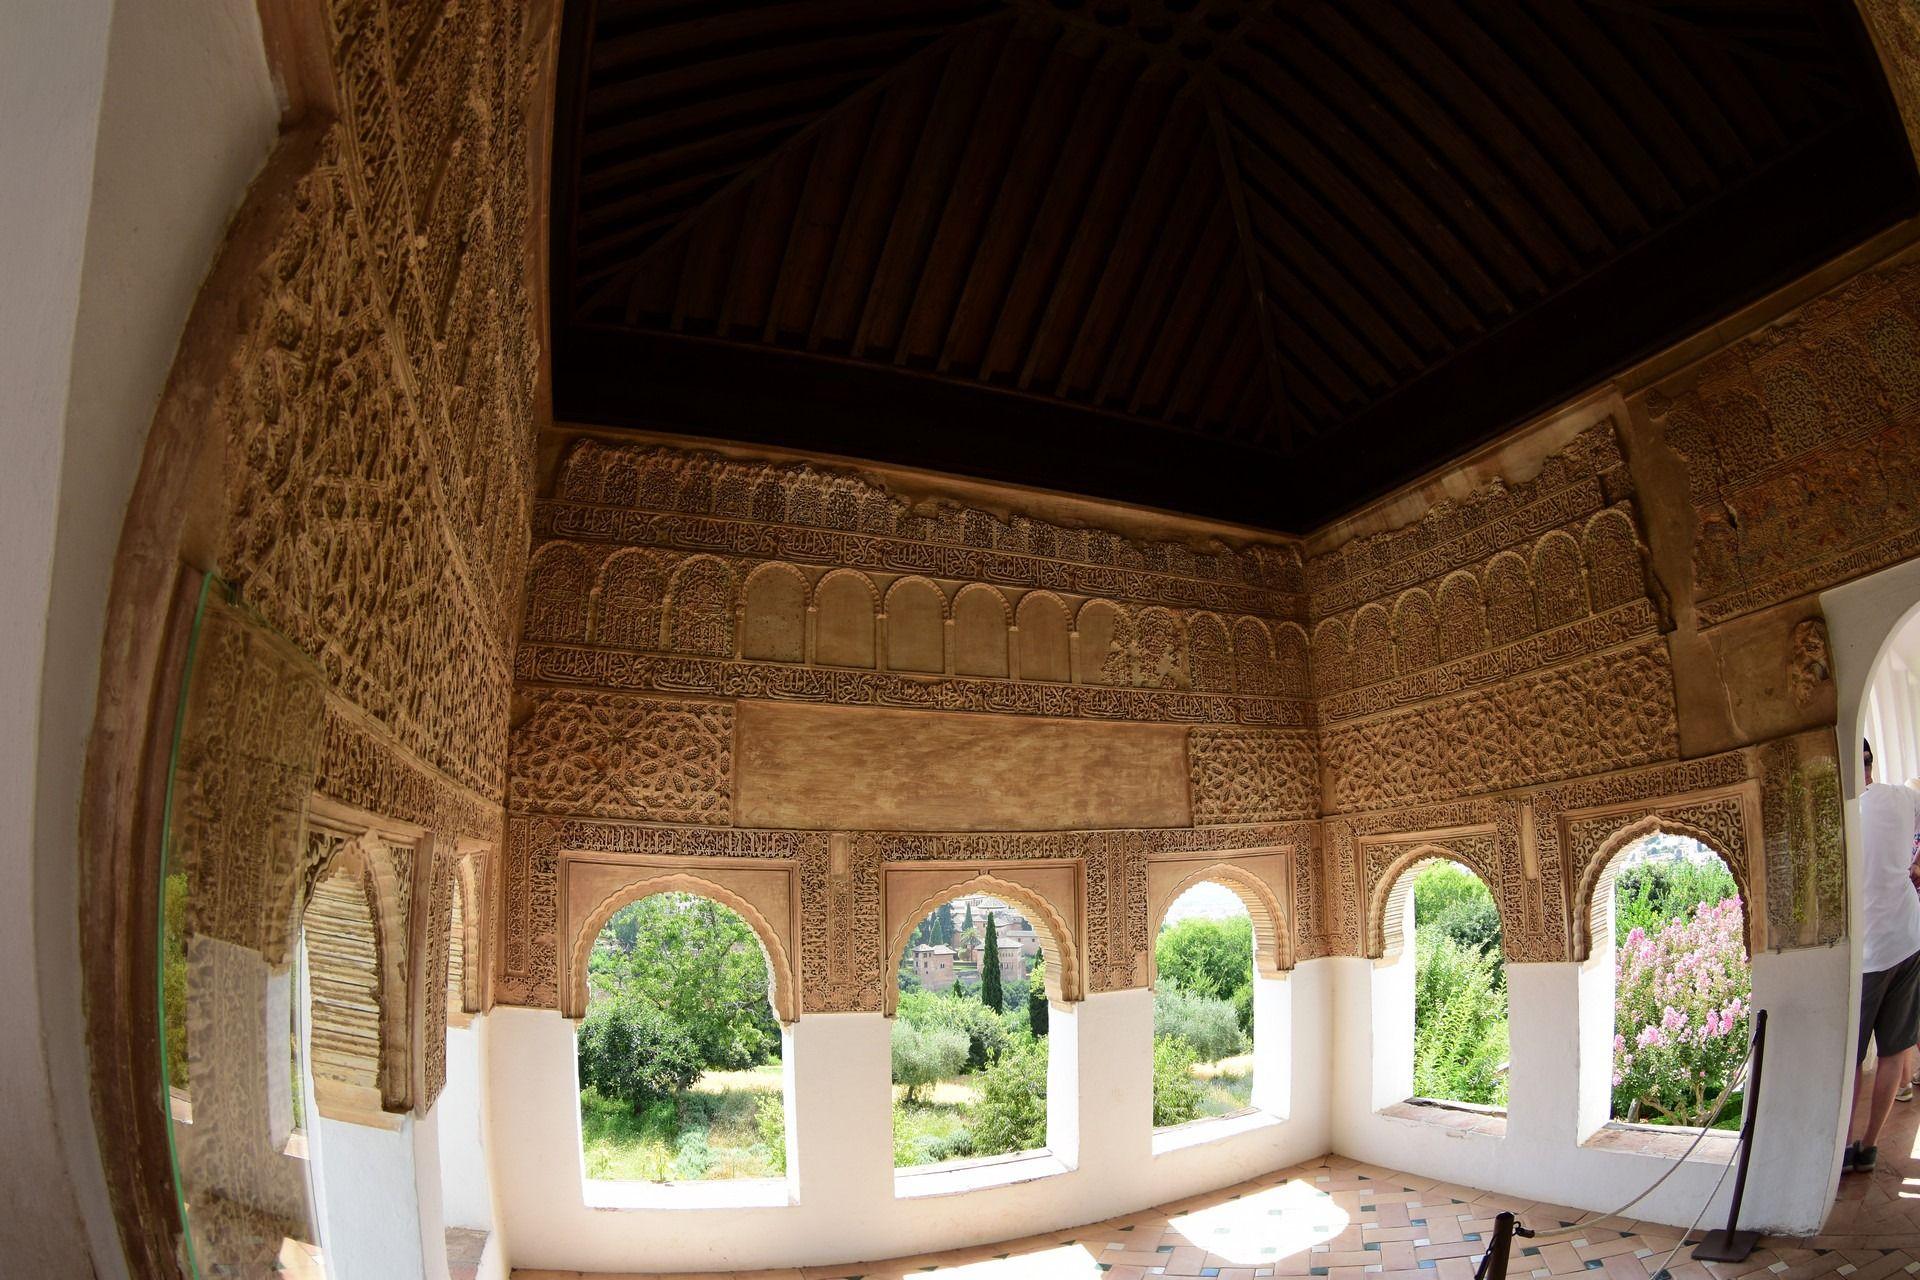 Spain – Granada: Alhambra